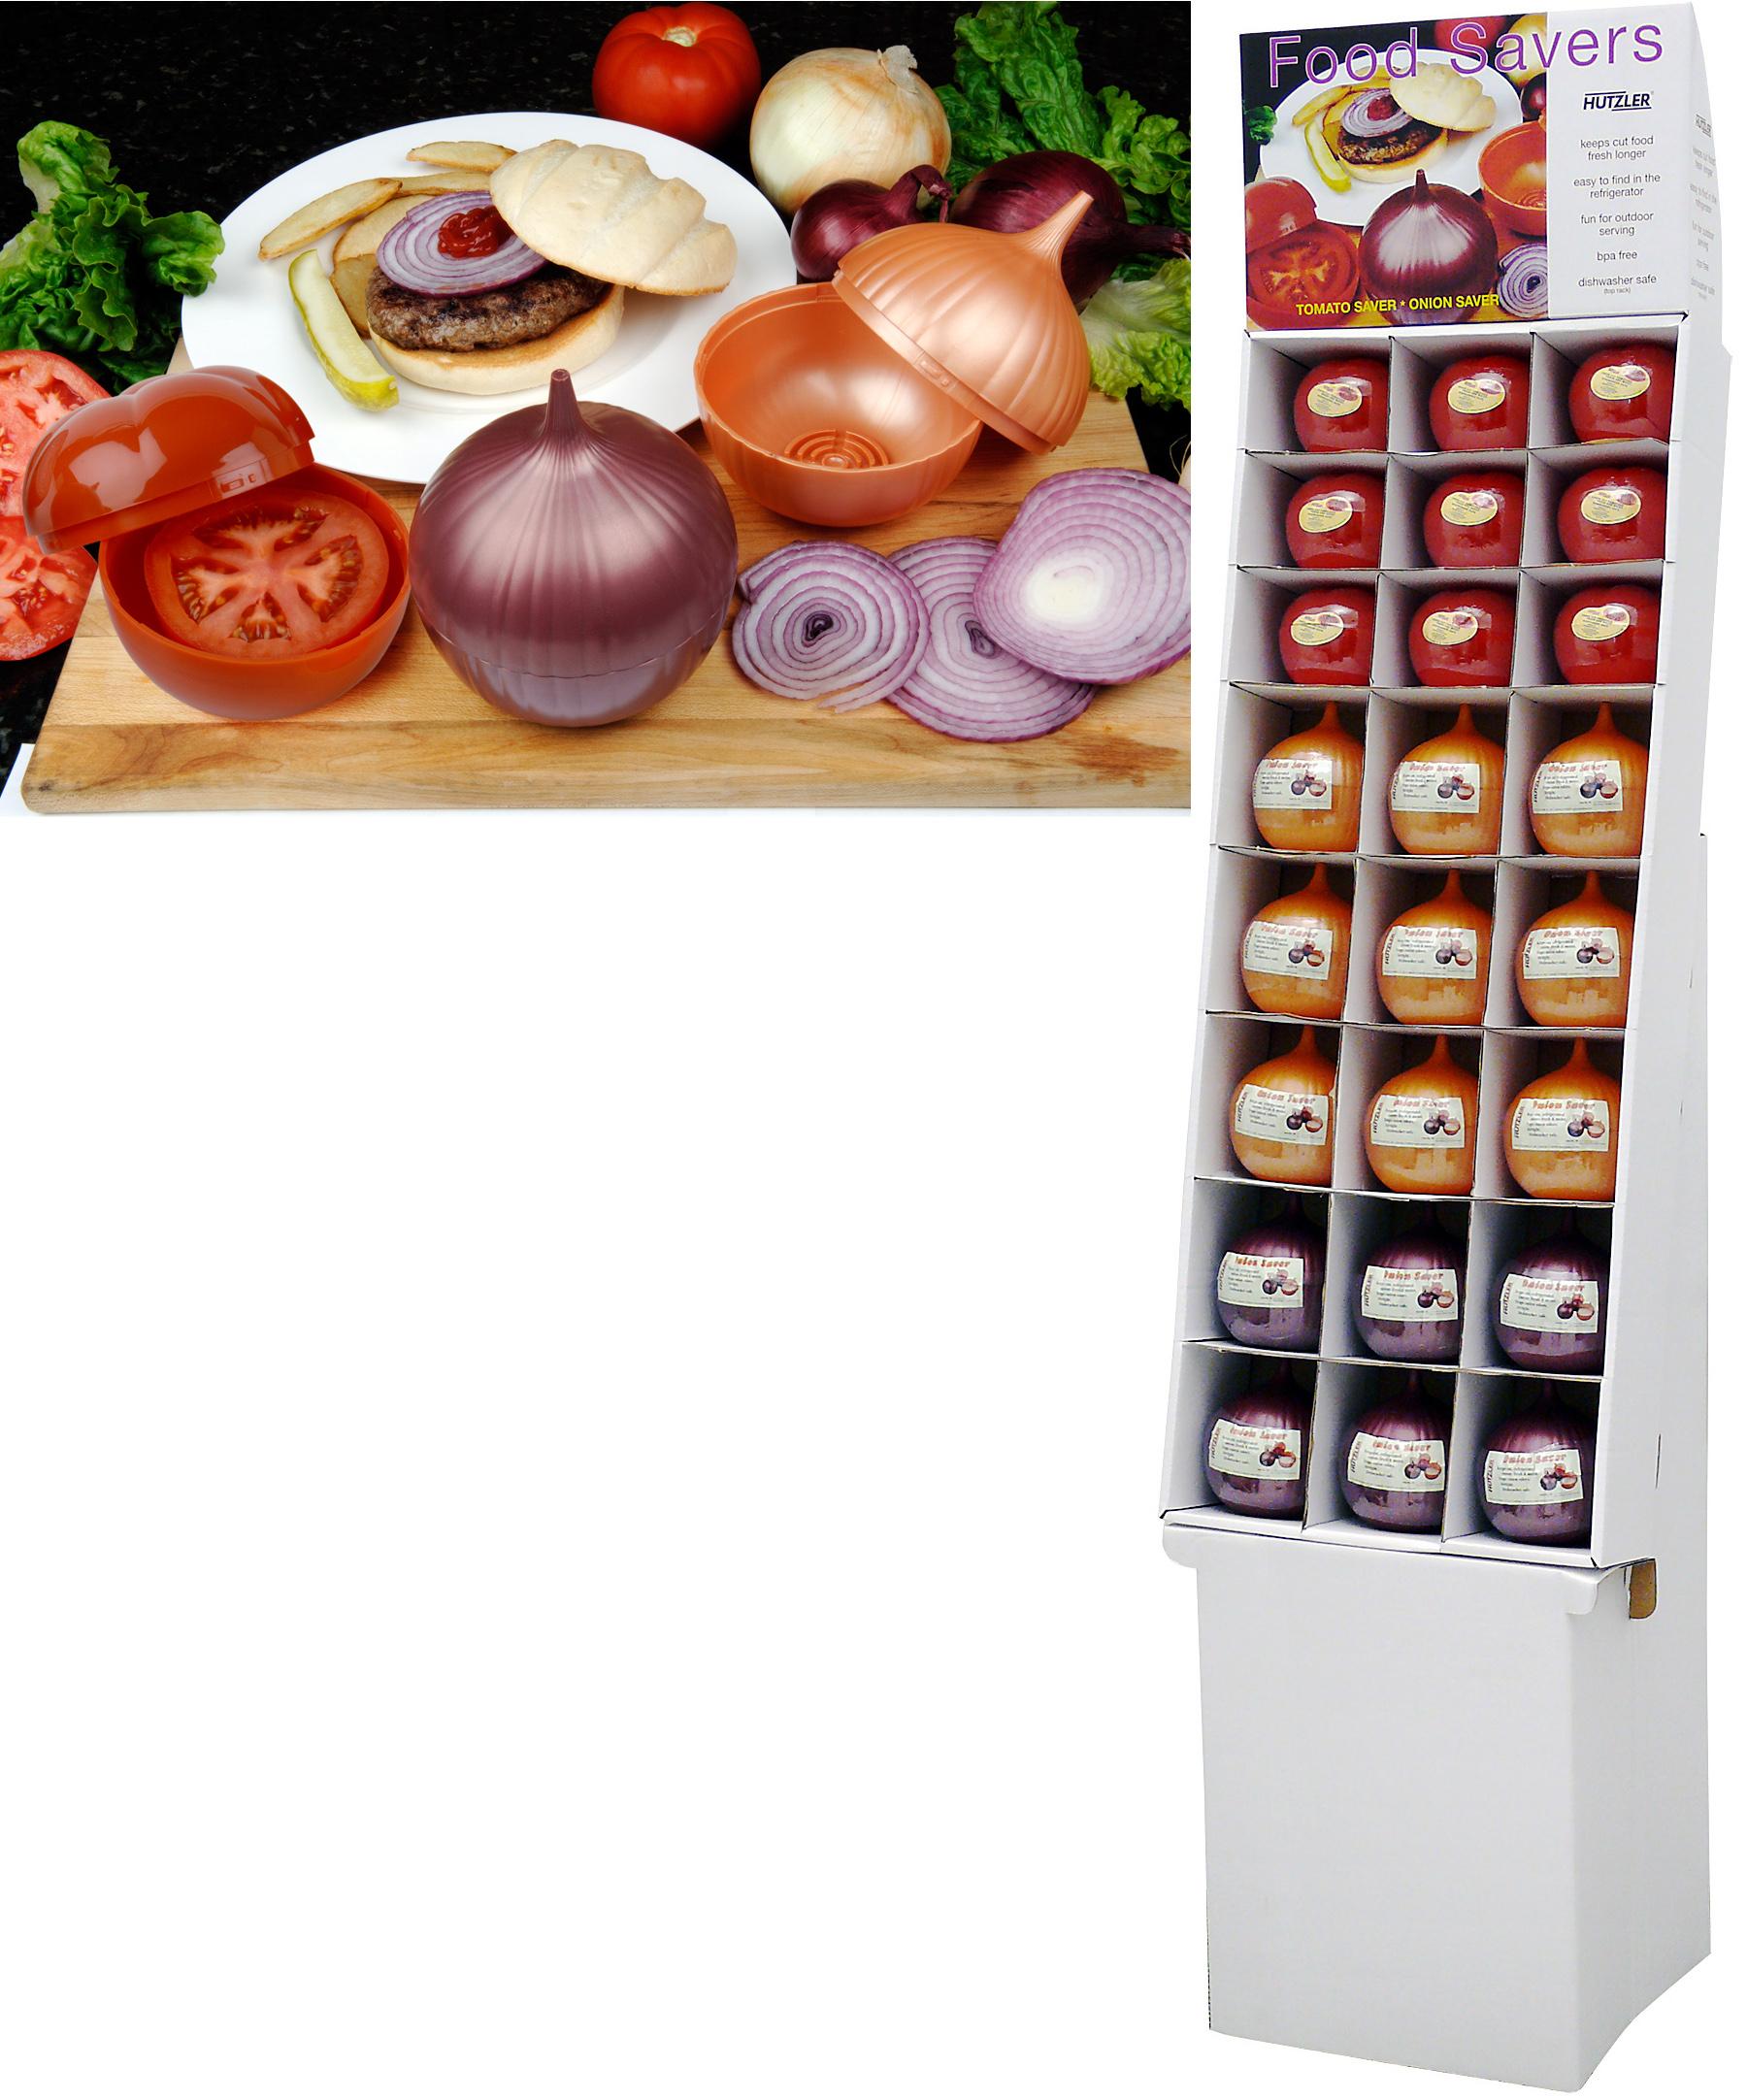 Image of Tomato & Onion Saver Floor Display (24 pack) 9 ea tomato savers 15 ea onion savers